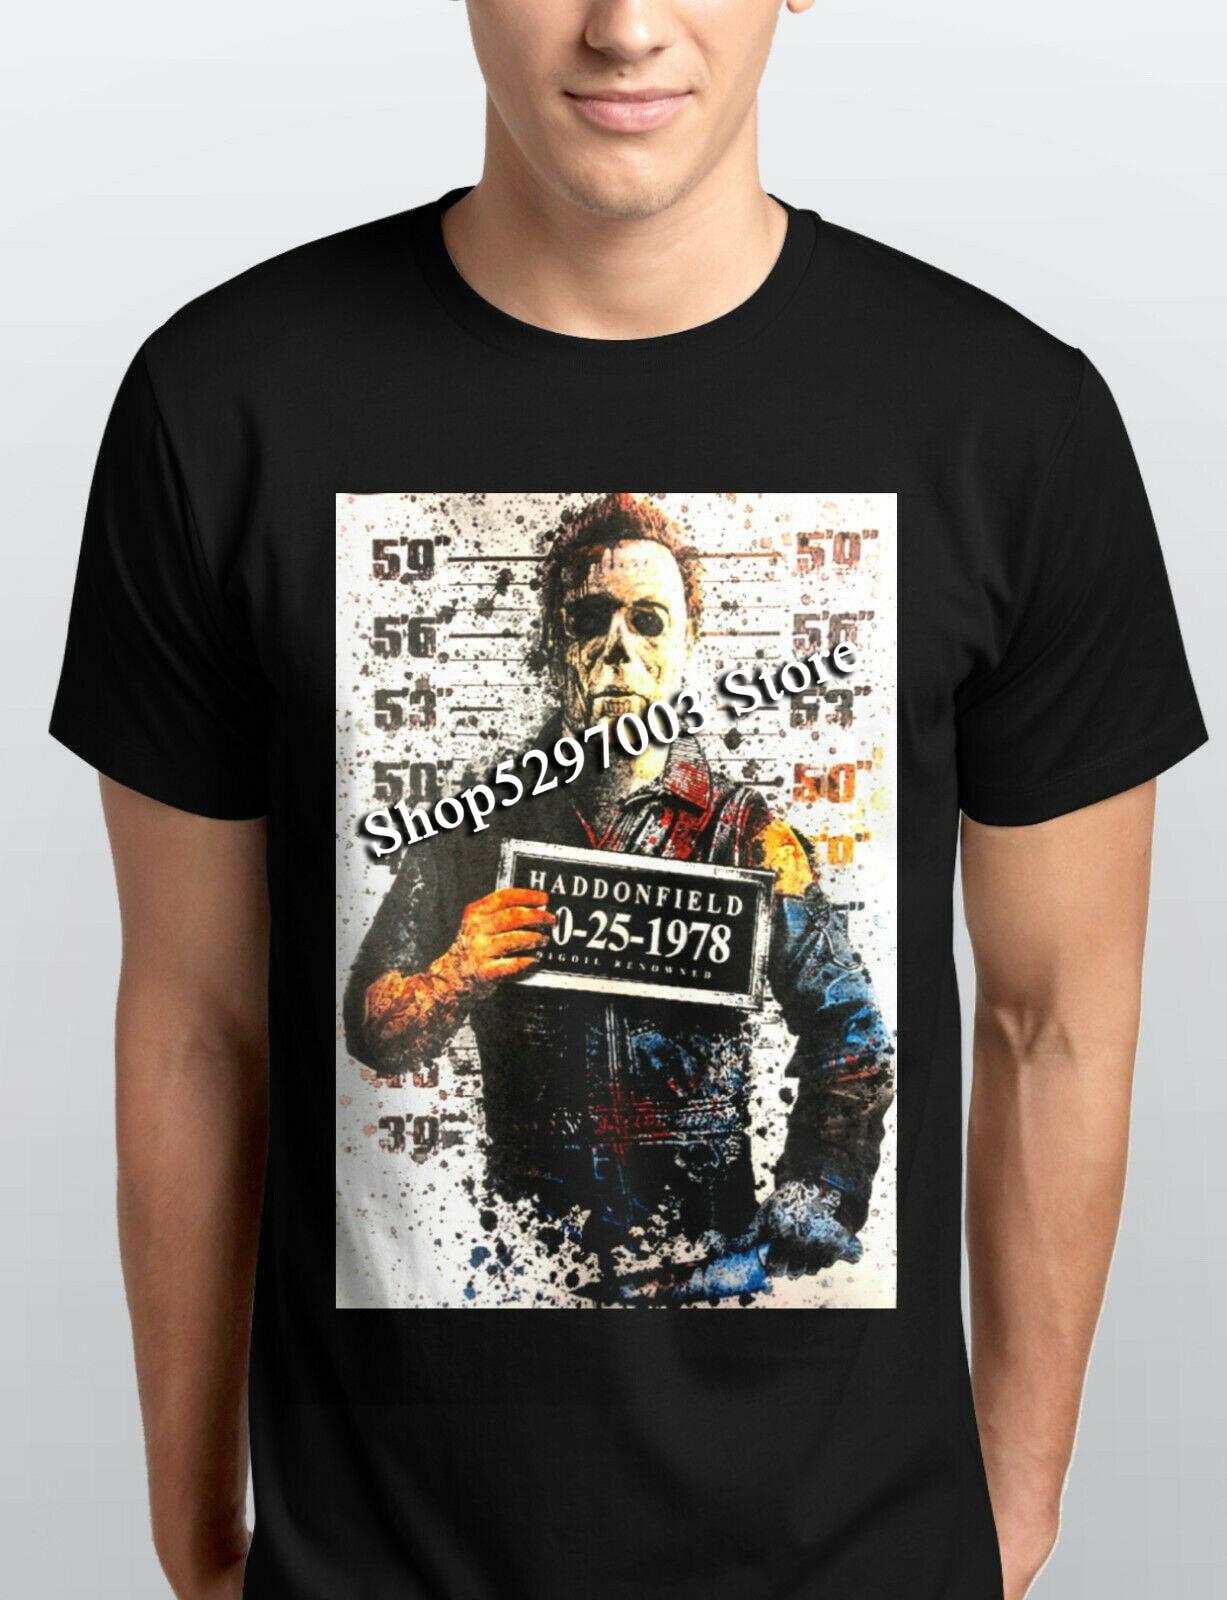 Michael Myers Halloween Haddonfield policía taza Shot película de terror camiseta nuevo tamaño grande Top camiseta